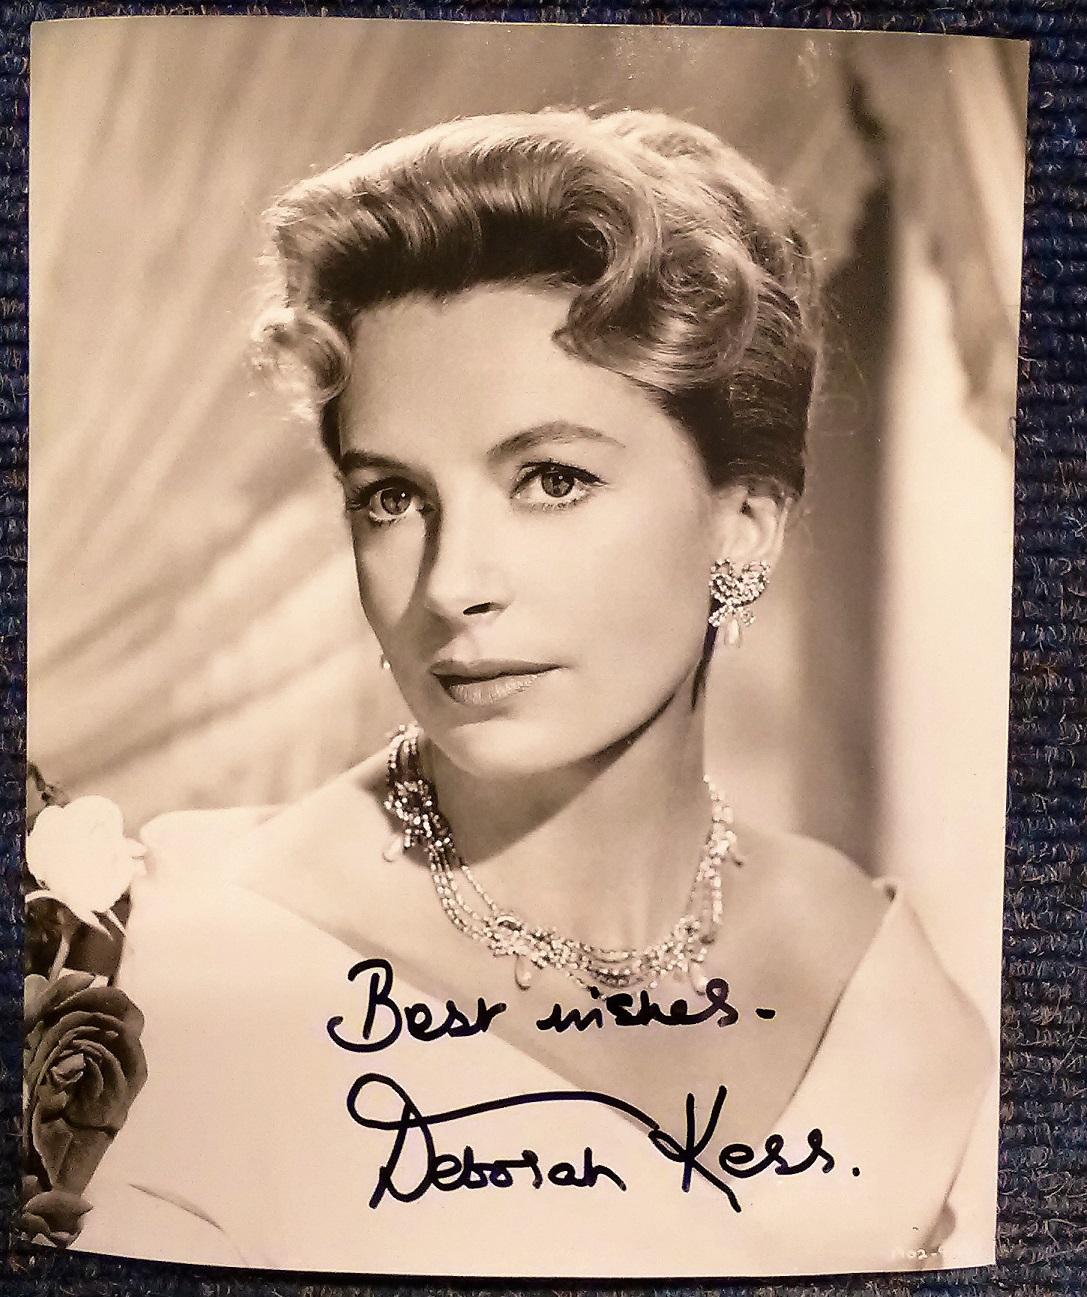 0636881b44243 Deborah Kerr signed 10 x 8 b/w portrait photo. Good Condition. All ...